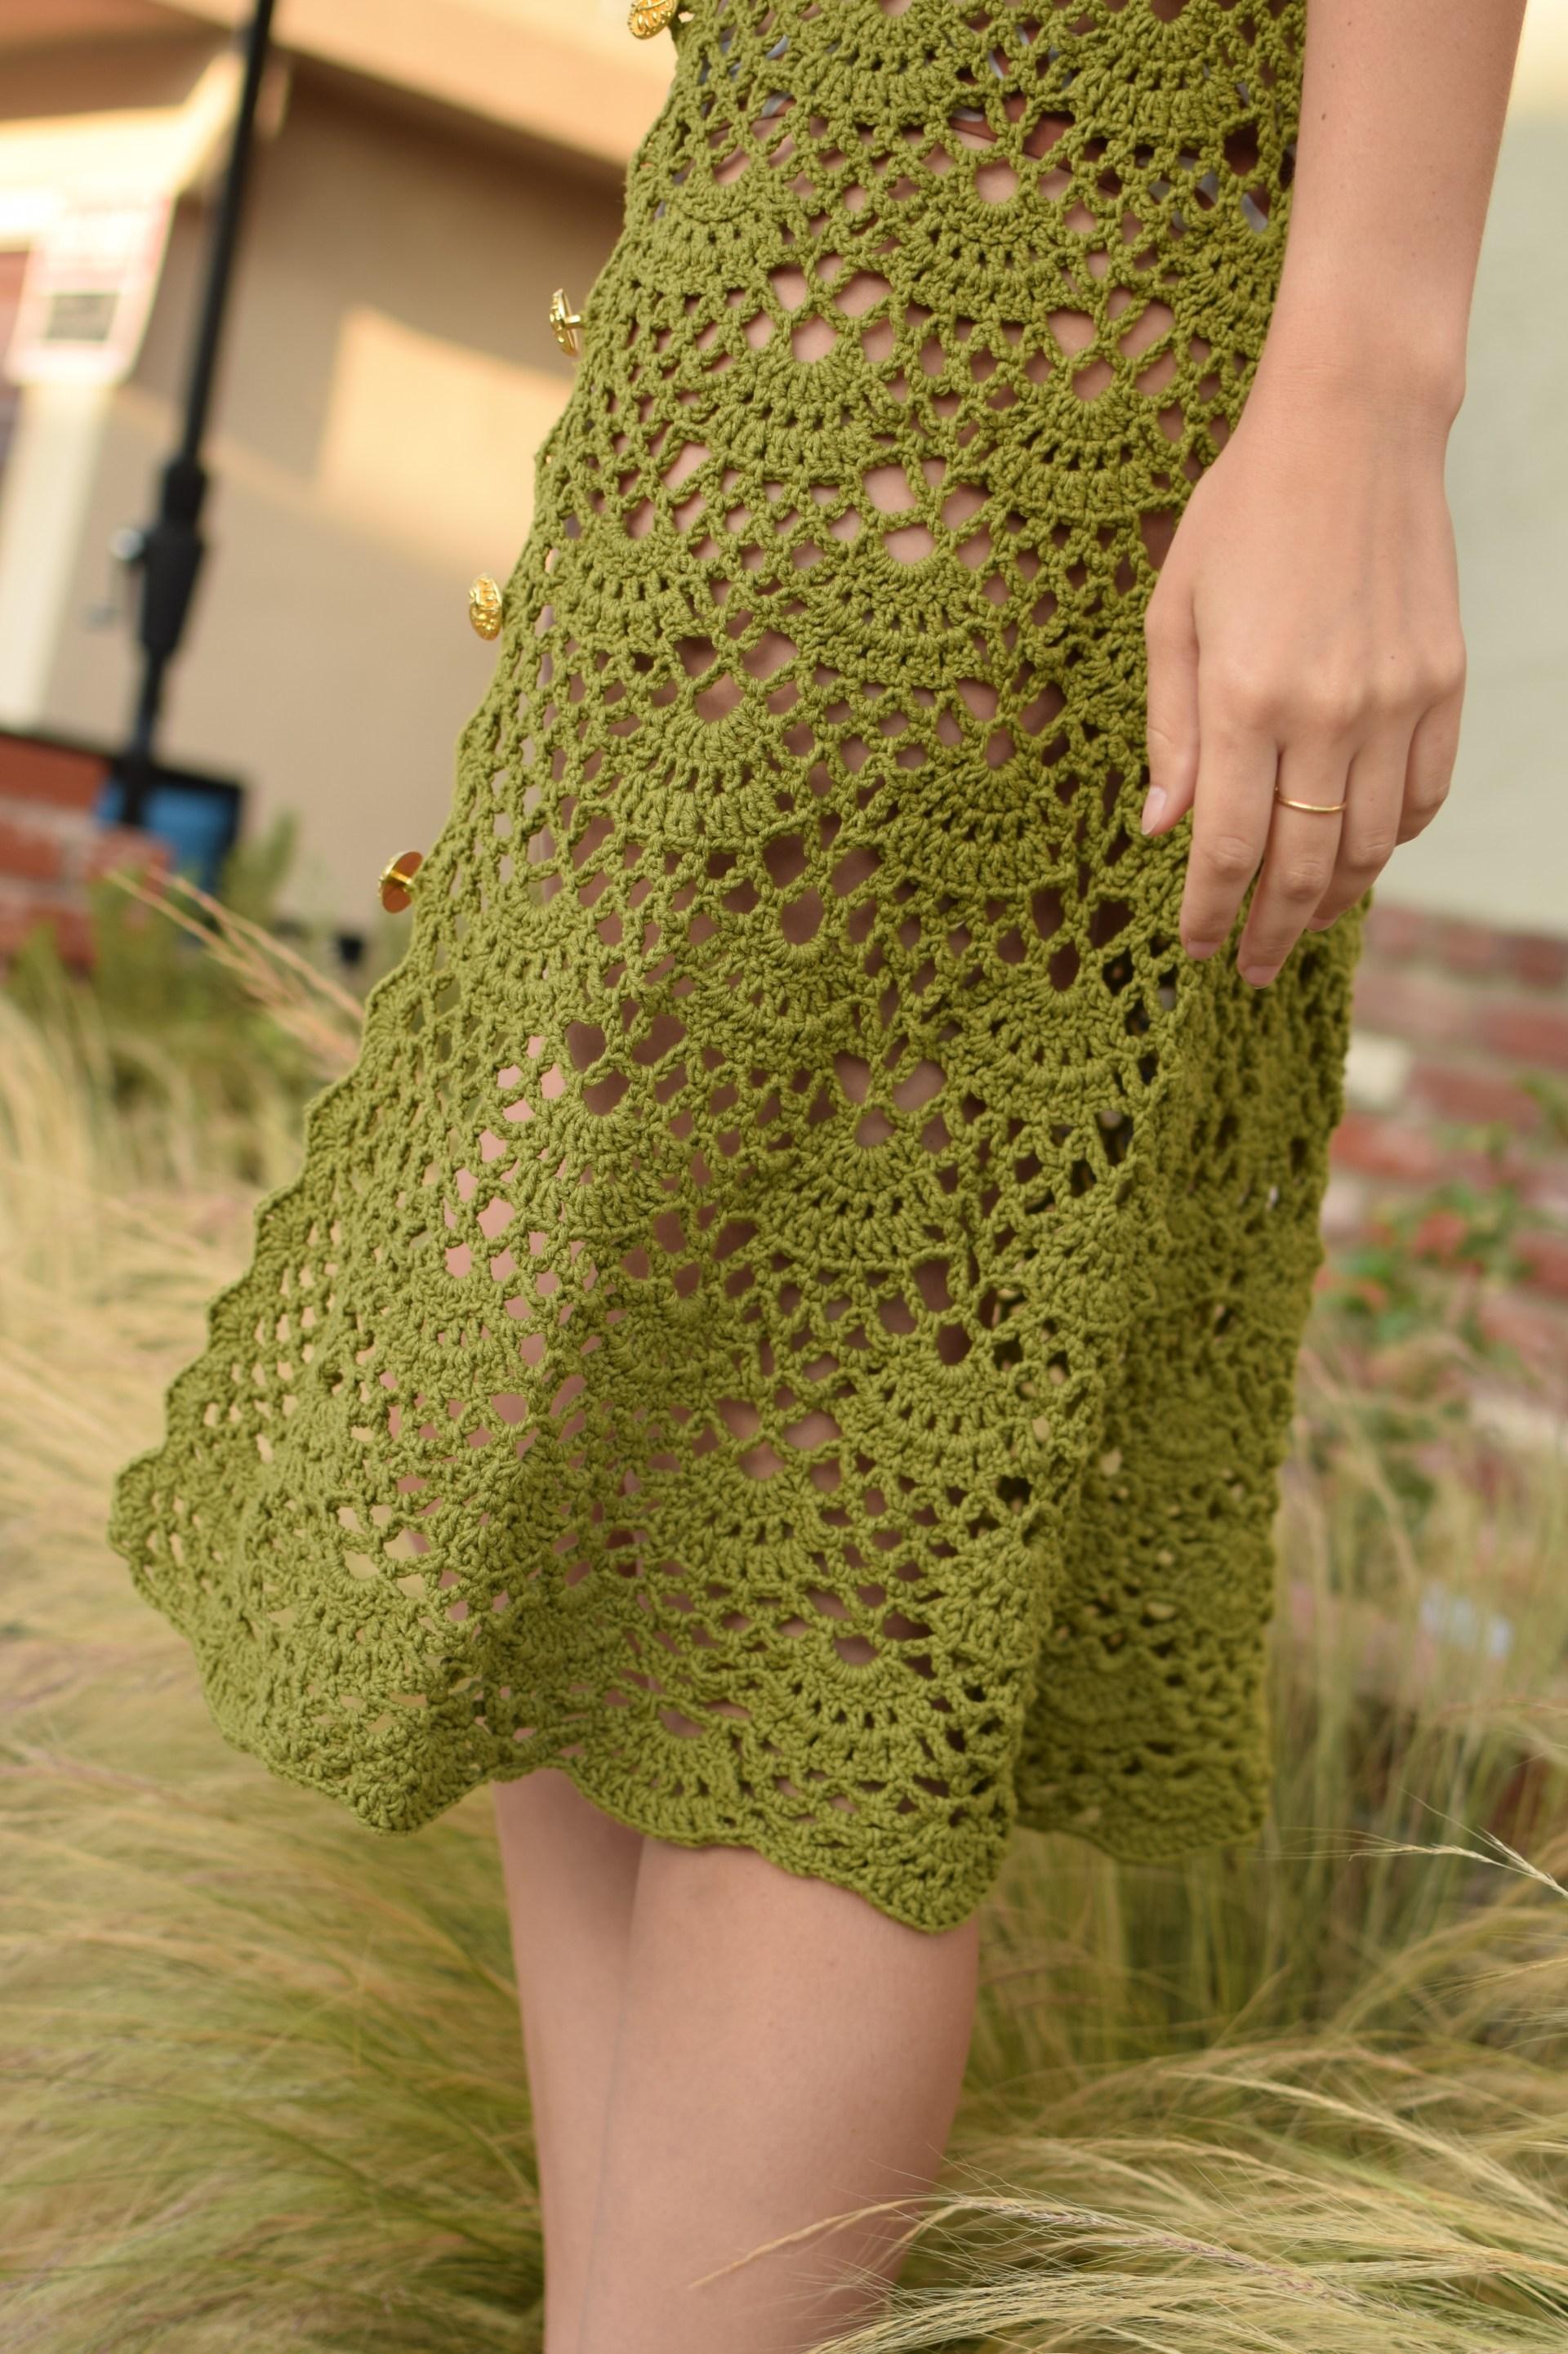 Life Lessons from LIB Crochet 2